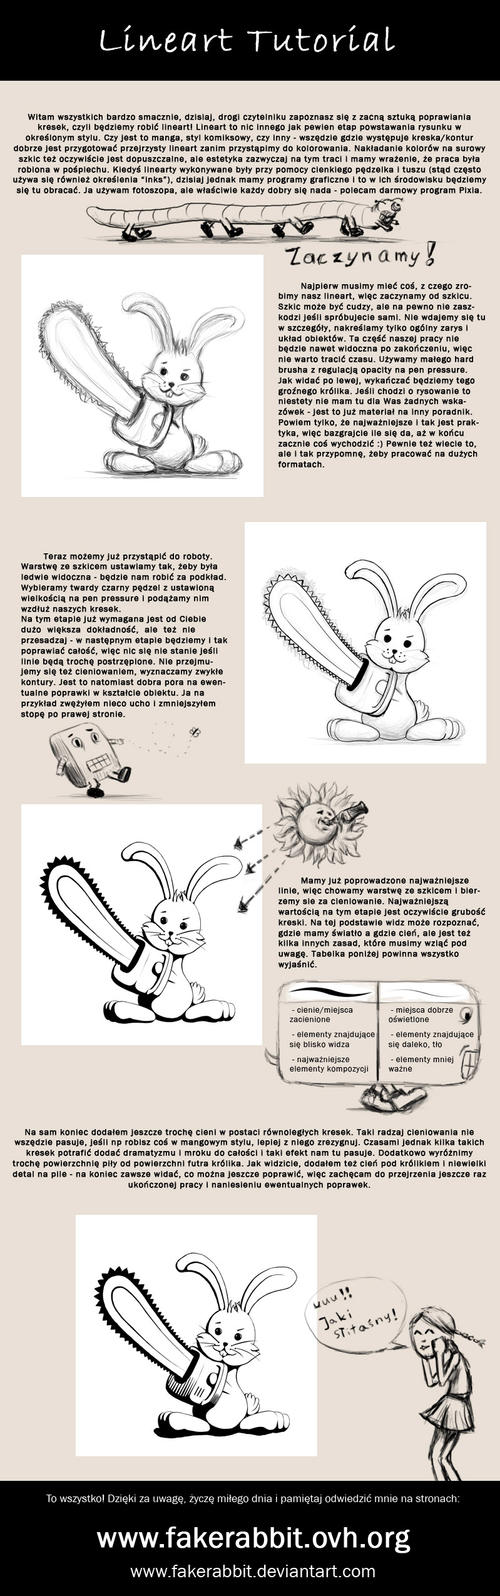 Line Art Tutorial Photo : Lineart tutorial by fakerabbit on deviantart